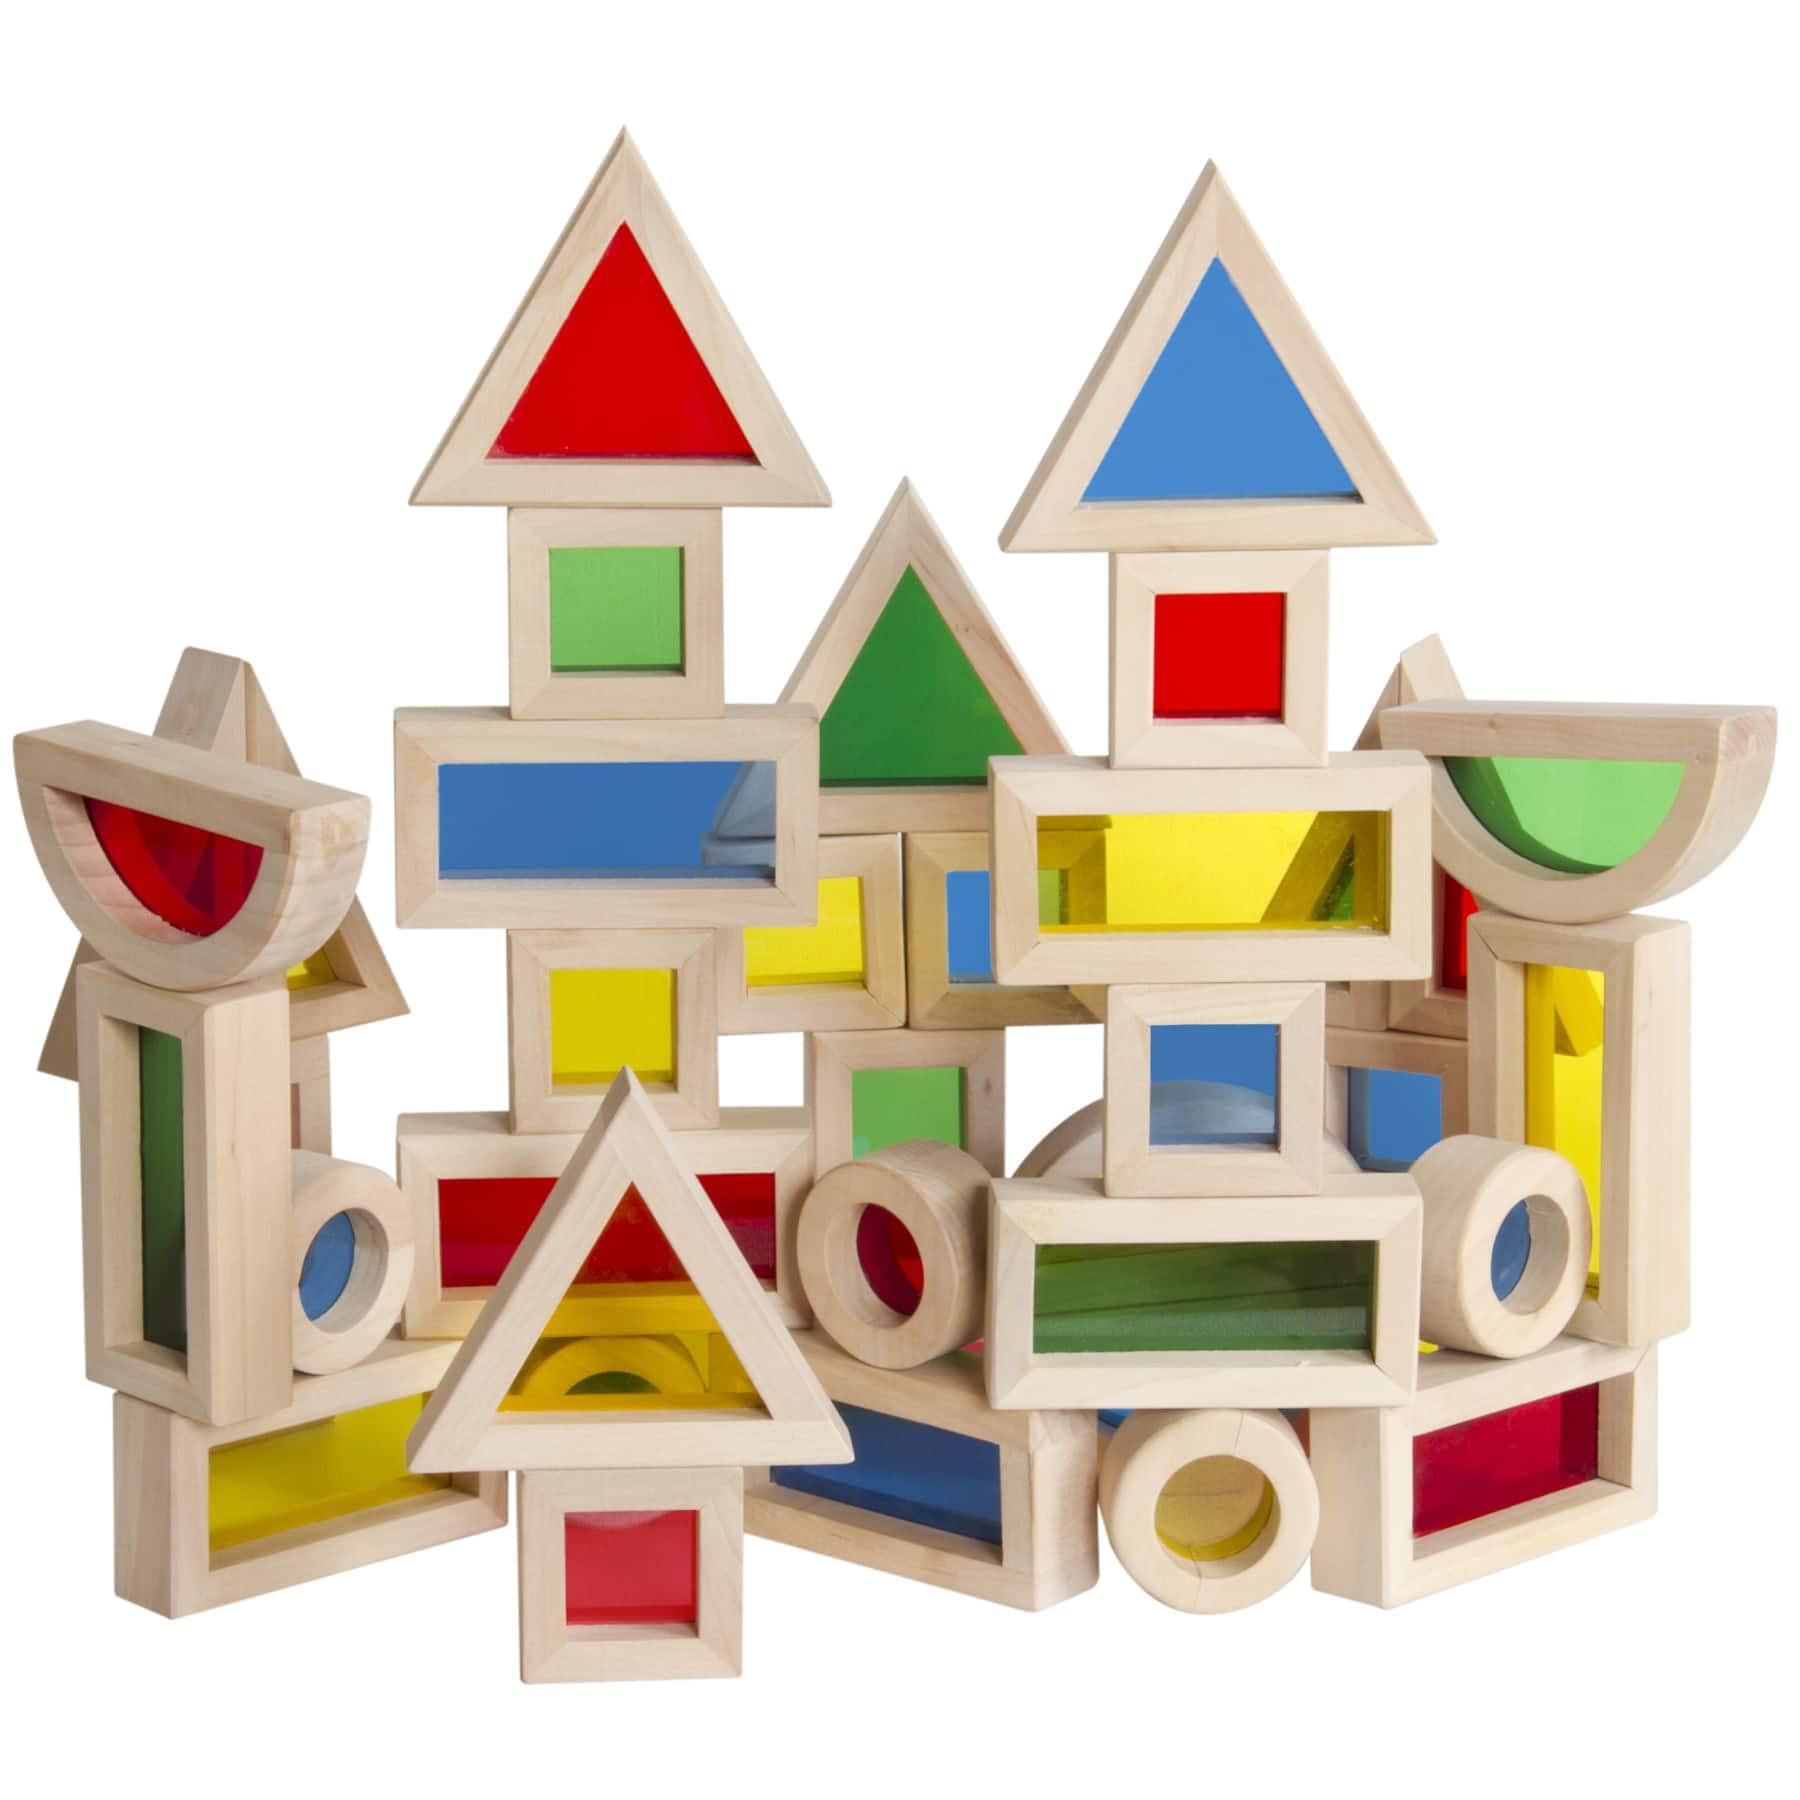 Guidecraft Jr Rainbow Block Set, 40pc by Guidecraft